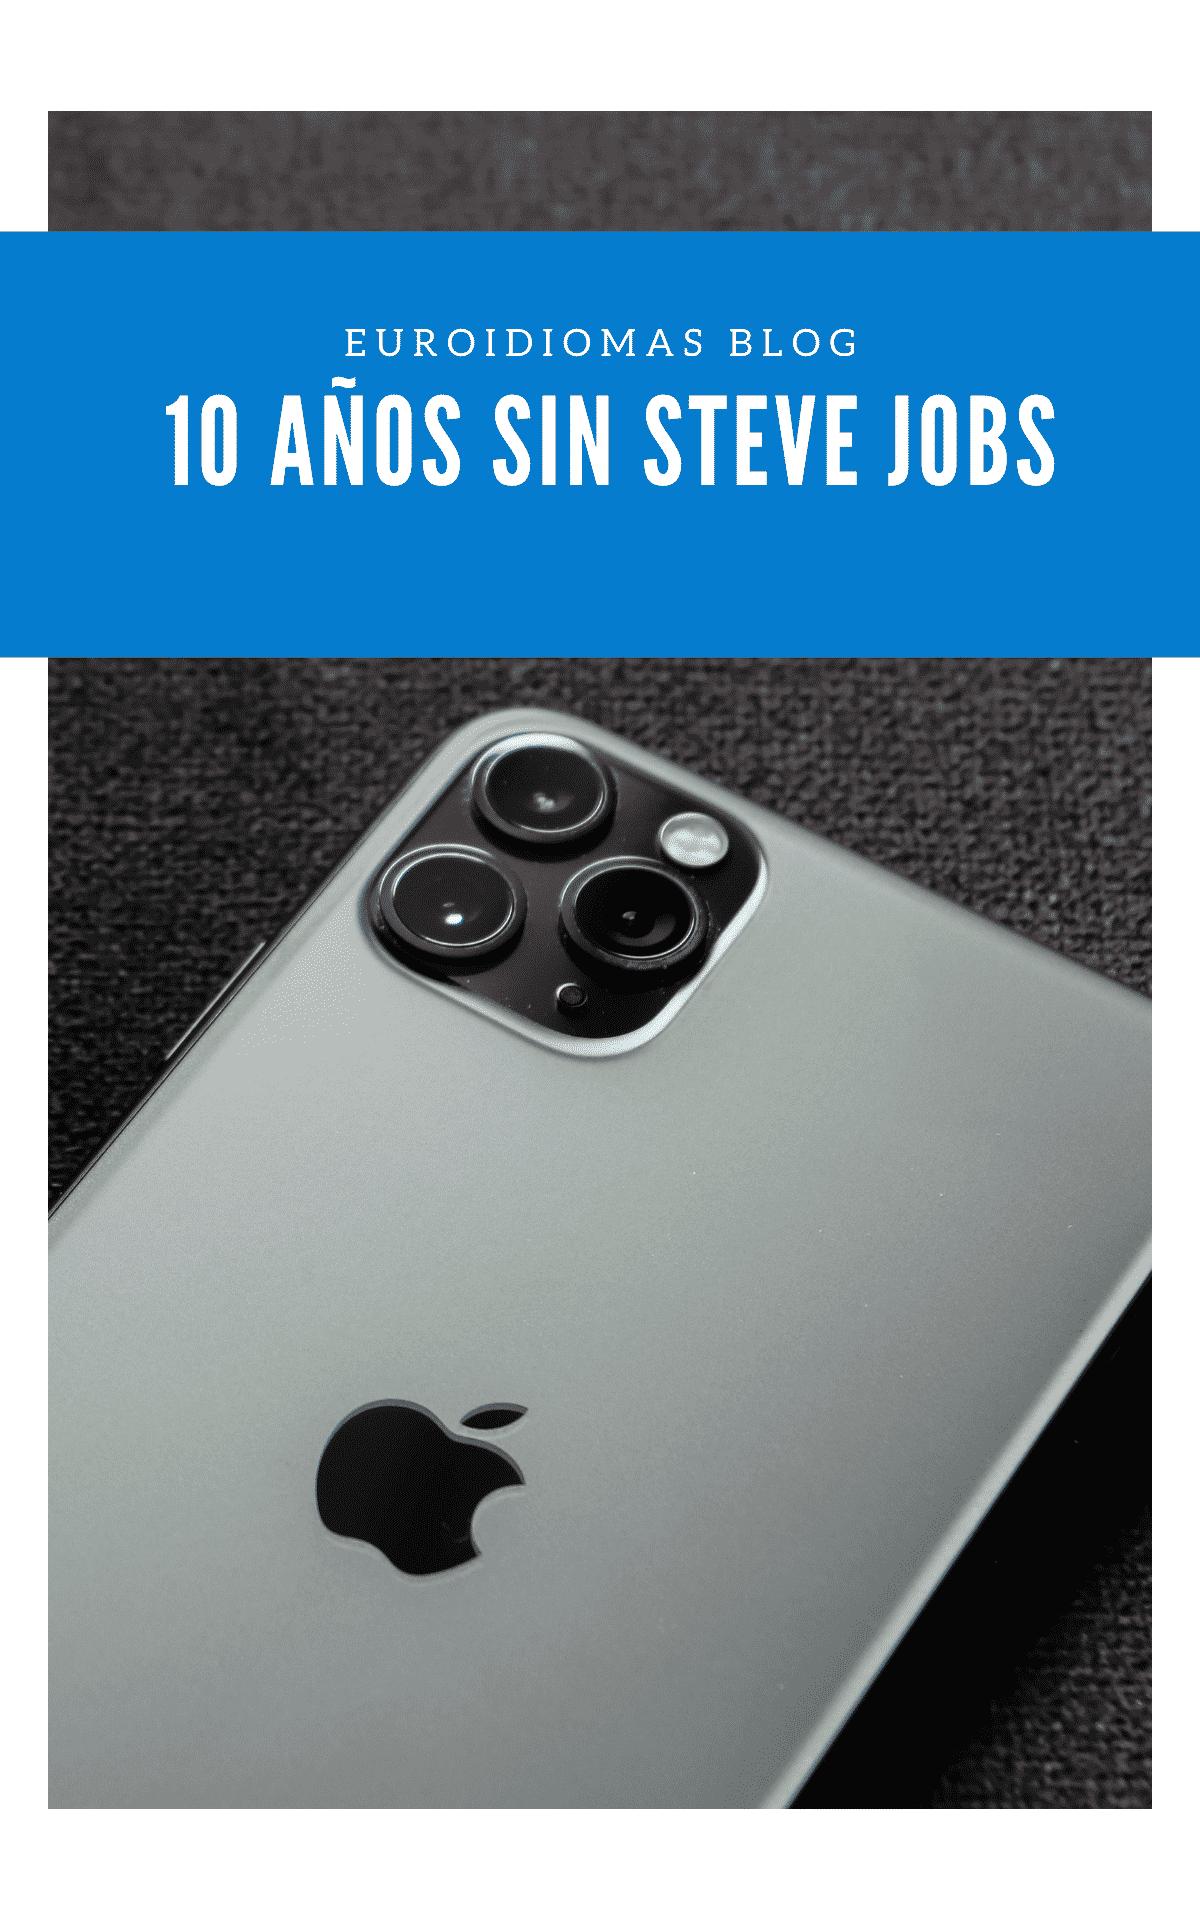 10 años sin Steve Jobs